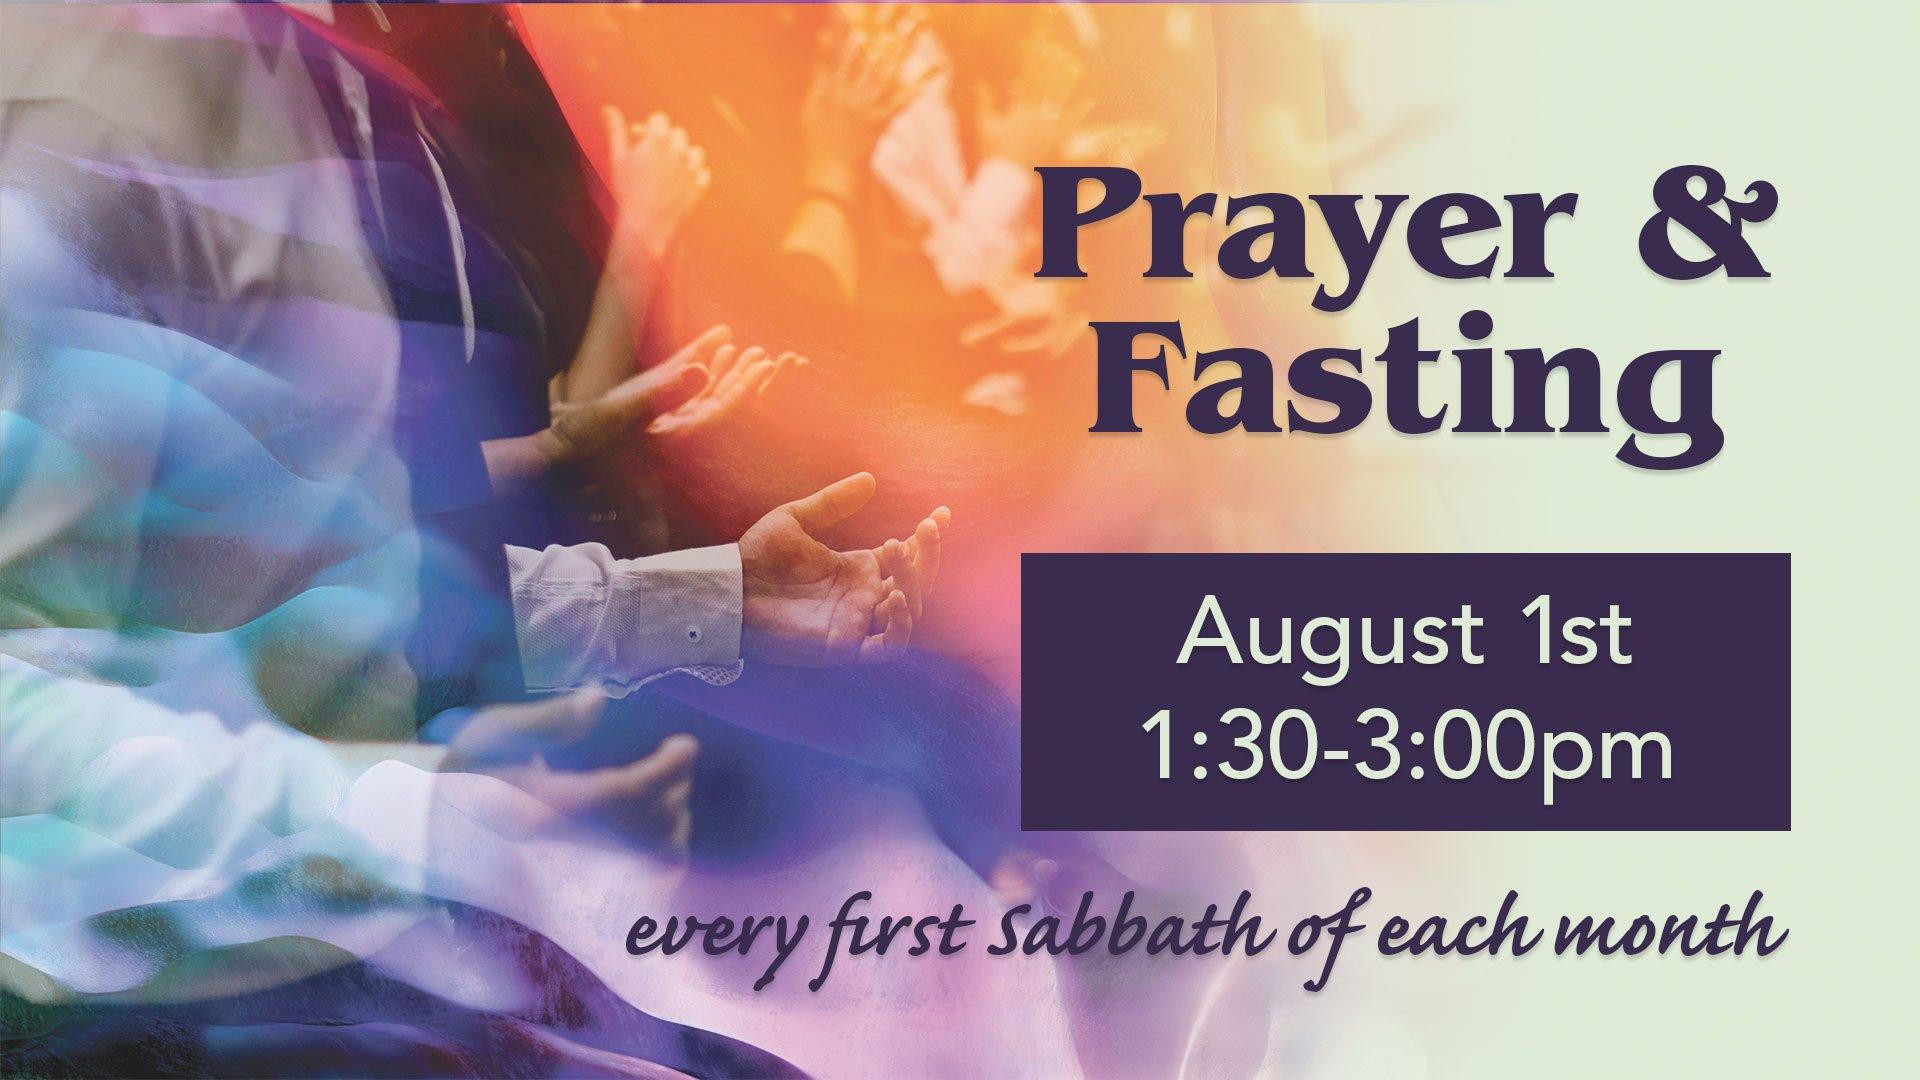 Prayer & Fasting flyer Aug 2020